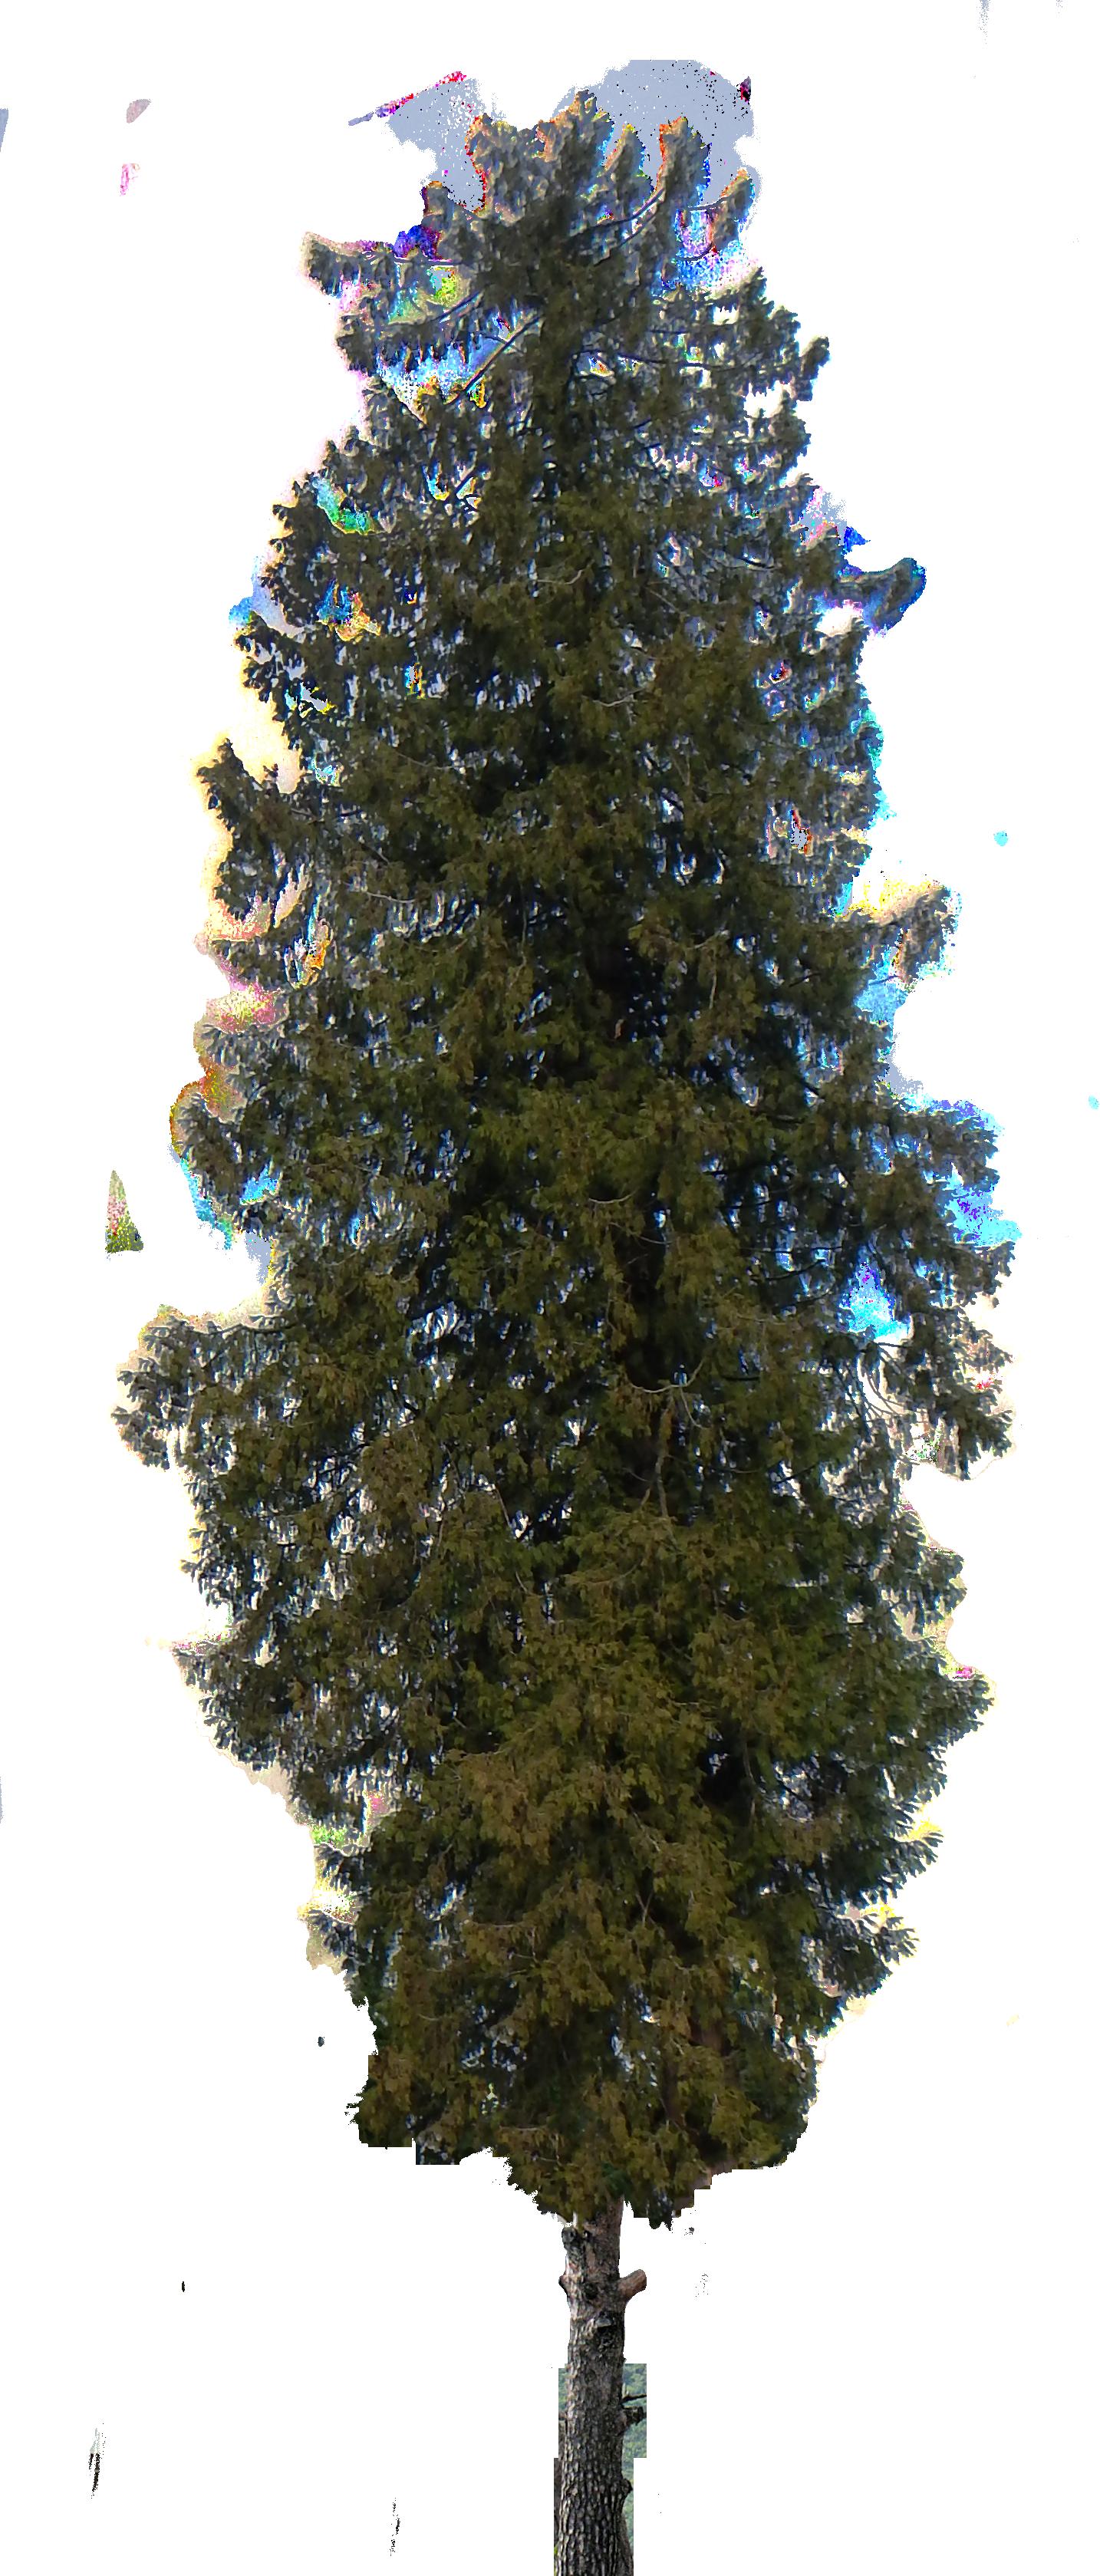 Clipart spruce tree clip black and white library Pine Tree Shrub Cedar Clip art - pine tree 1434*3358 transprent Png ... clip black and white library